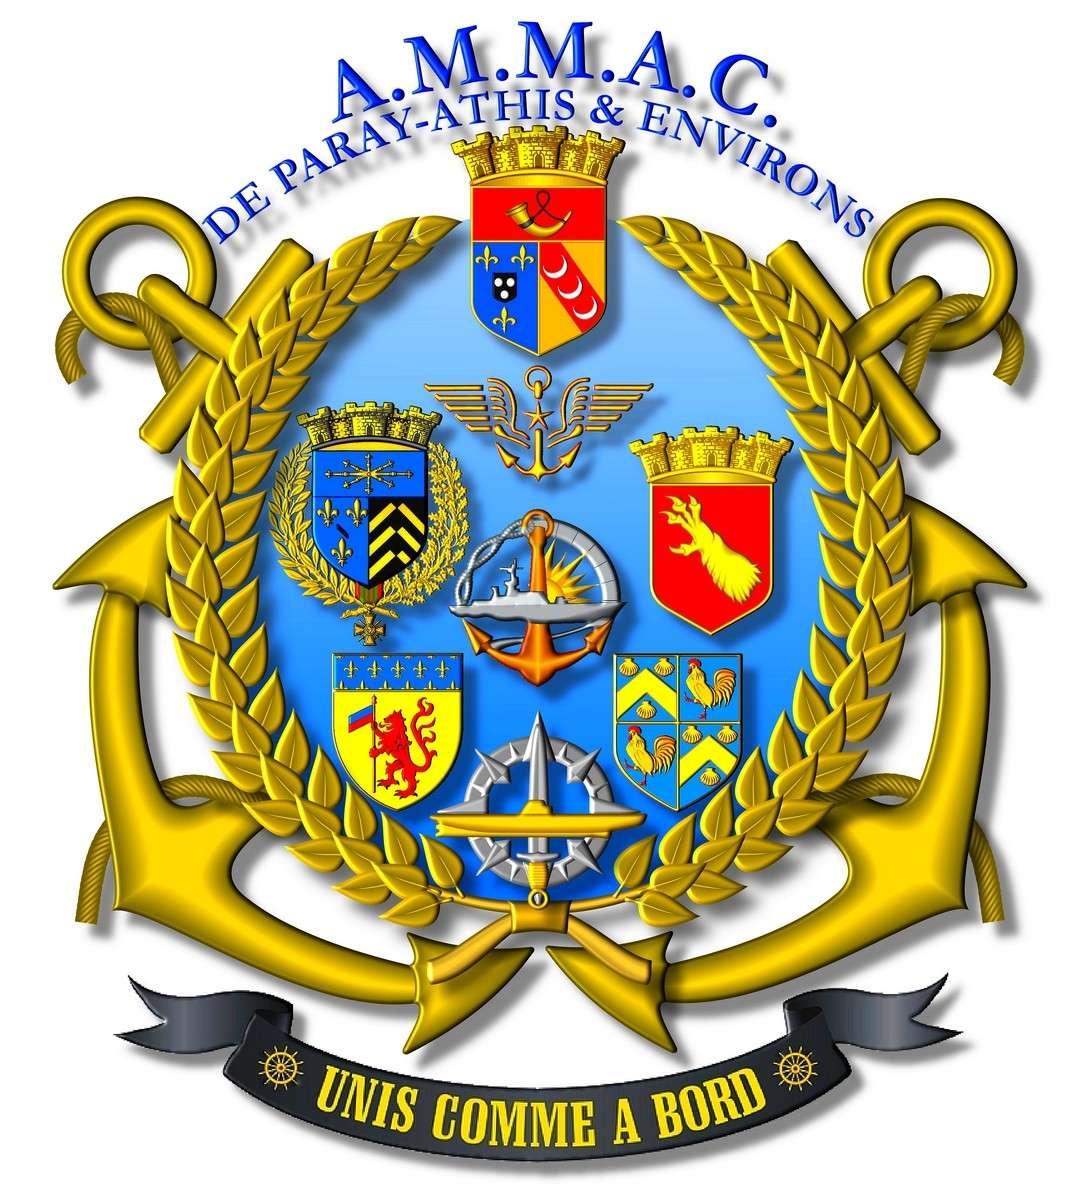 [ Associations anciens Marins ] L'AMMAC DE PARAY-ATHIS & ENVIRONS A 60 ANS... - Page 2 Logo_a10